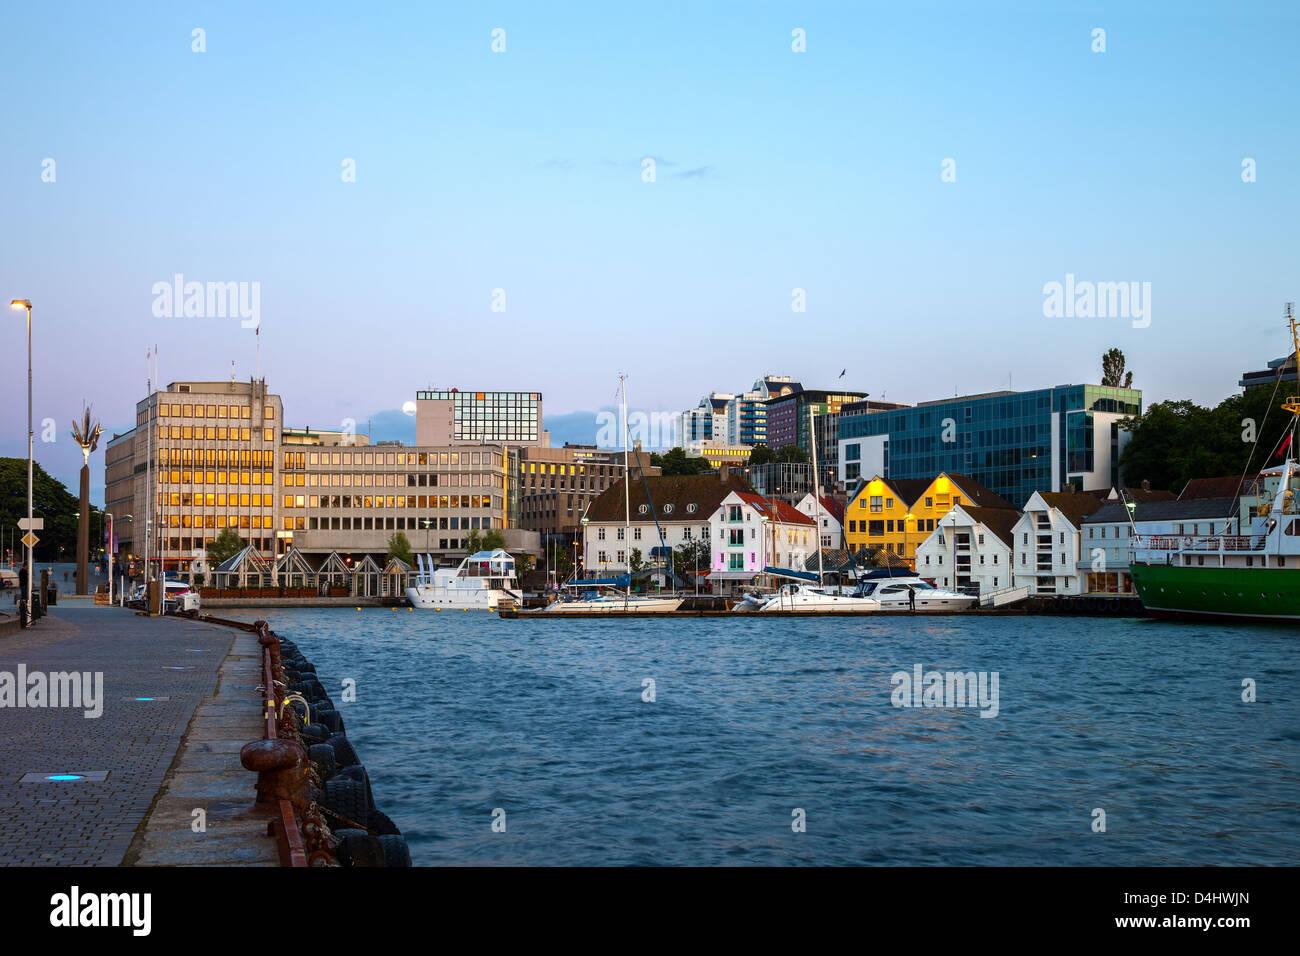 Centro di Stavanger in serata, Norvegia. Foto Stock